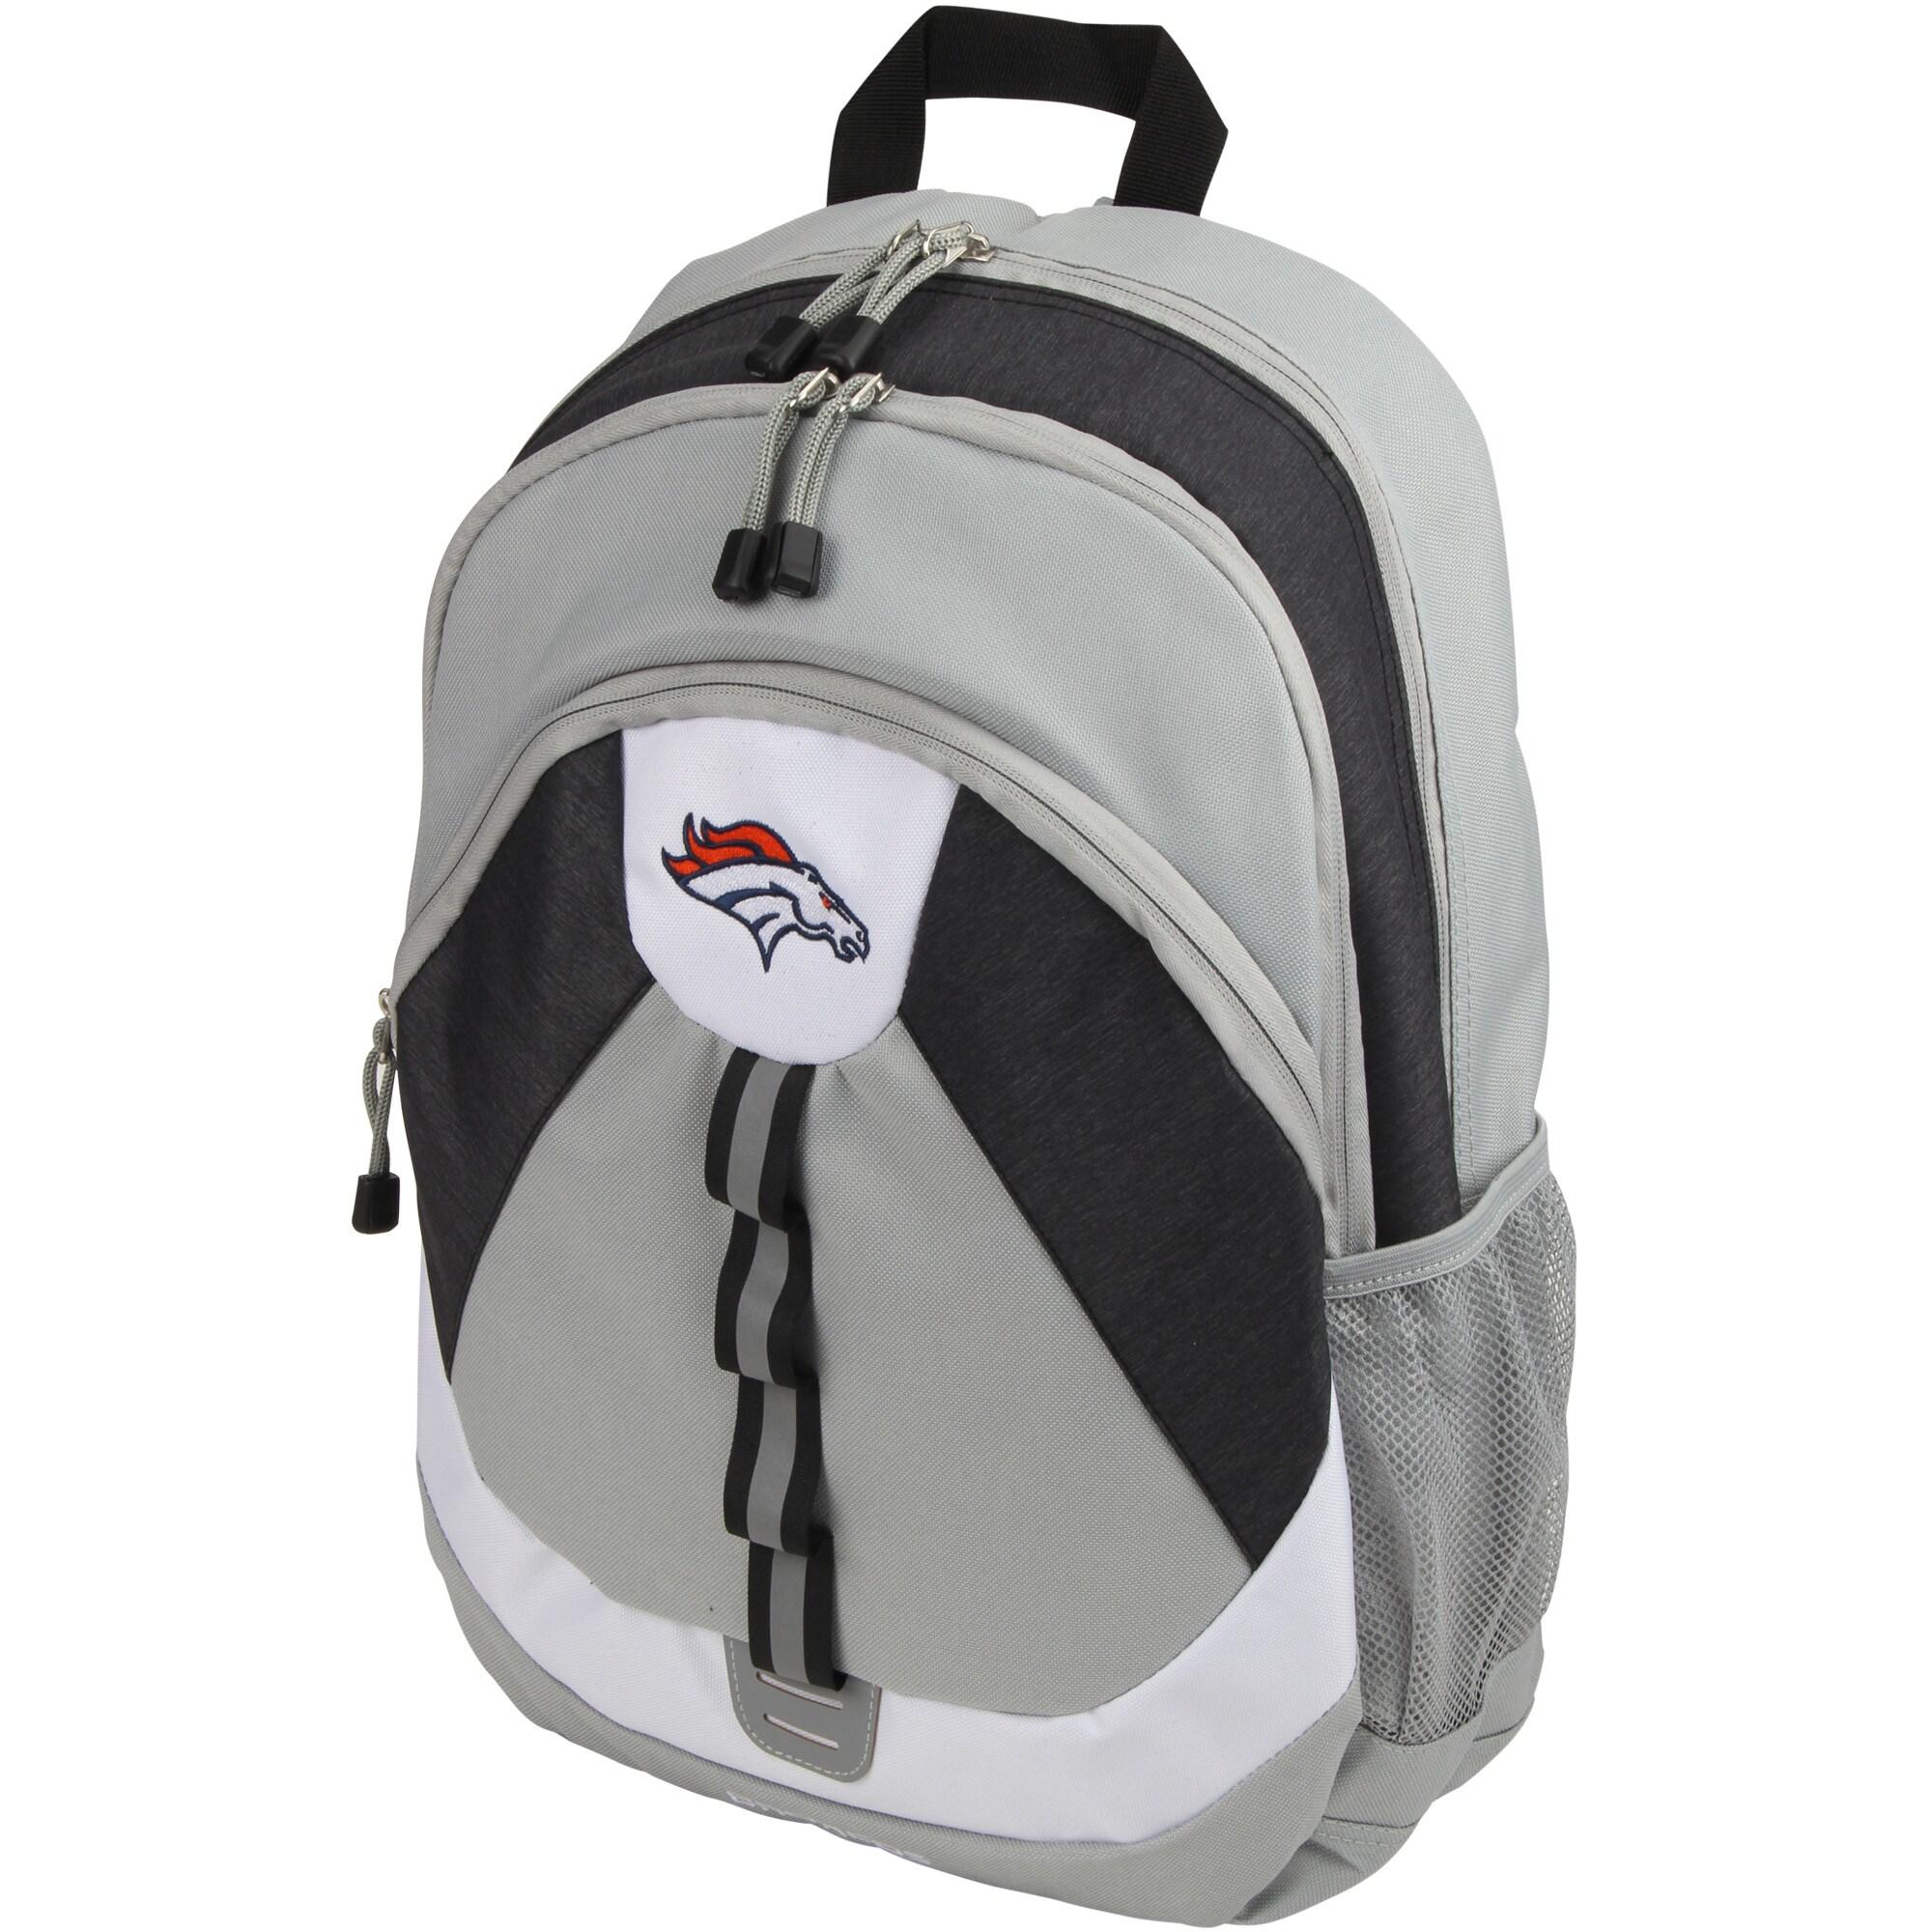 Denver Broncos The Northwest Company Women's Kinetic Backpack - Gray